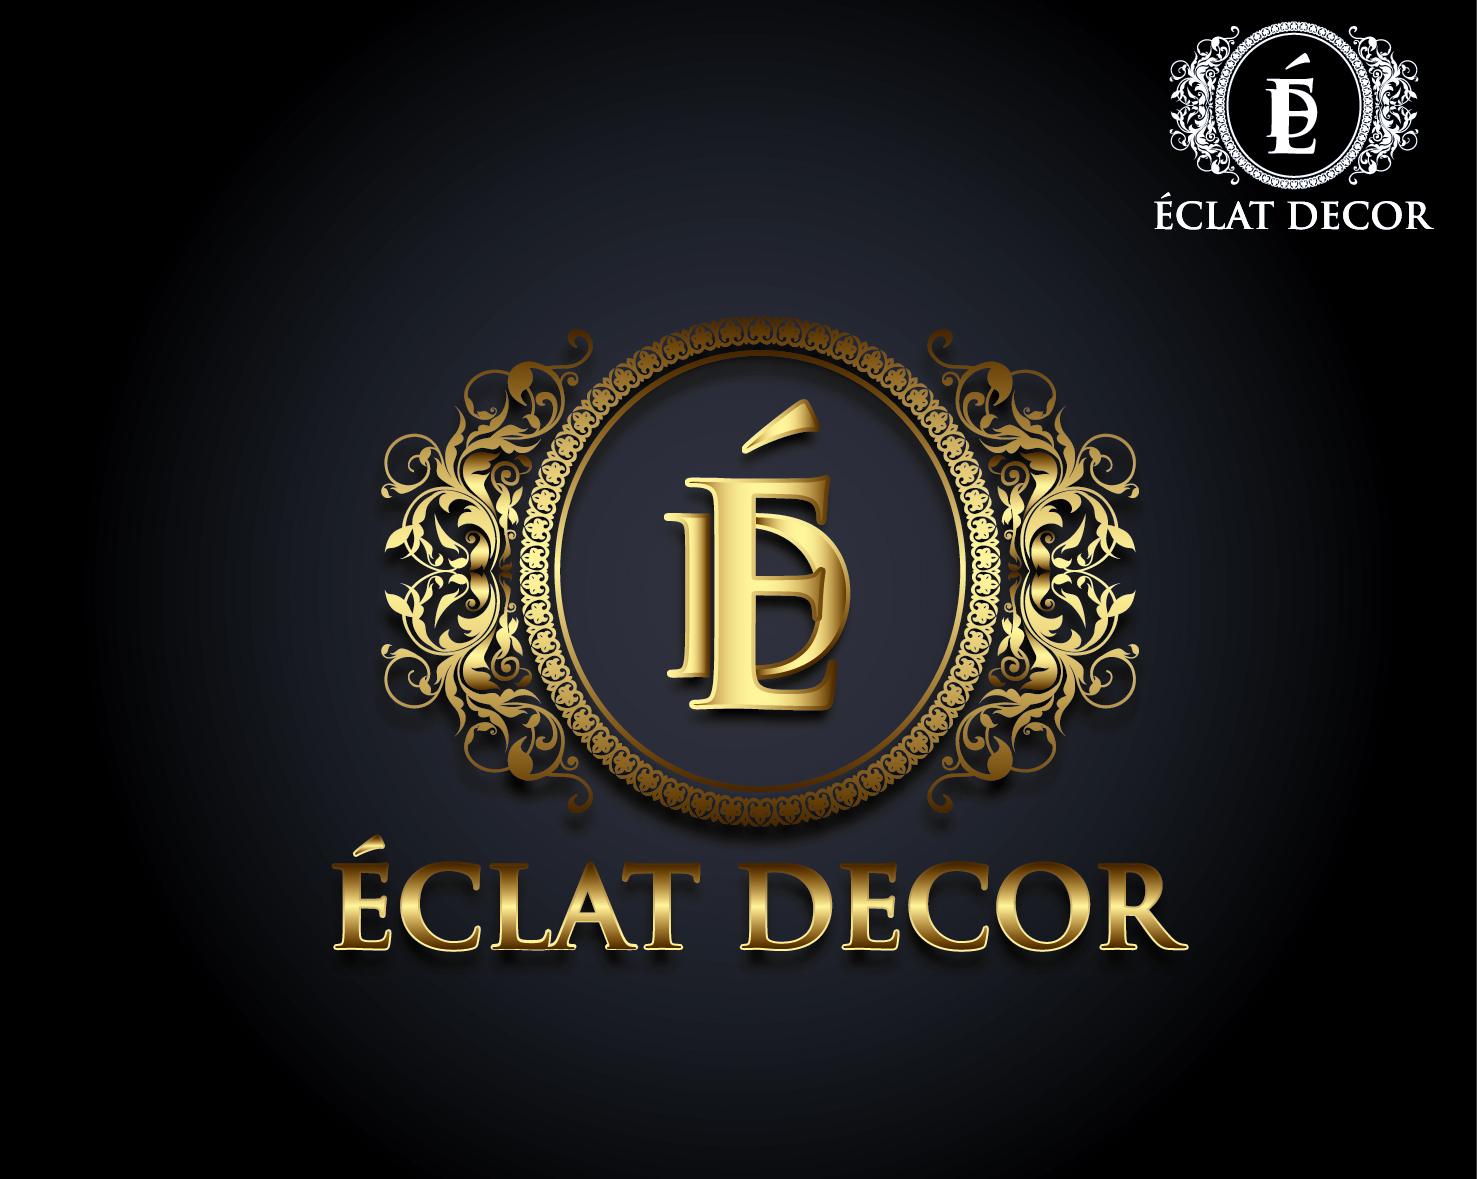 Logo Design by VENTSISLAV KOVACHEV - Entry No. 48 in the Logo Design Contest Imaginative Logo Design for Éclat Decor.